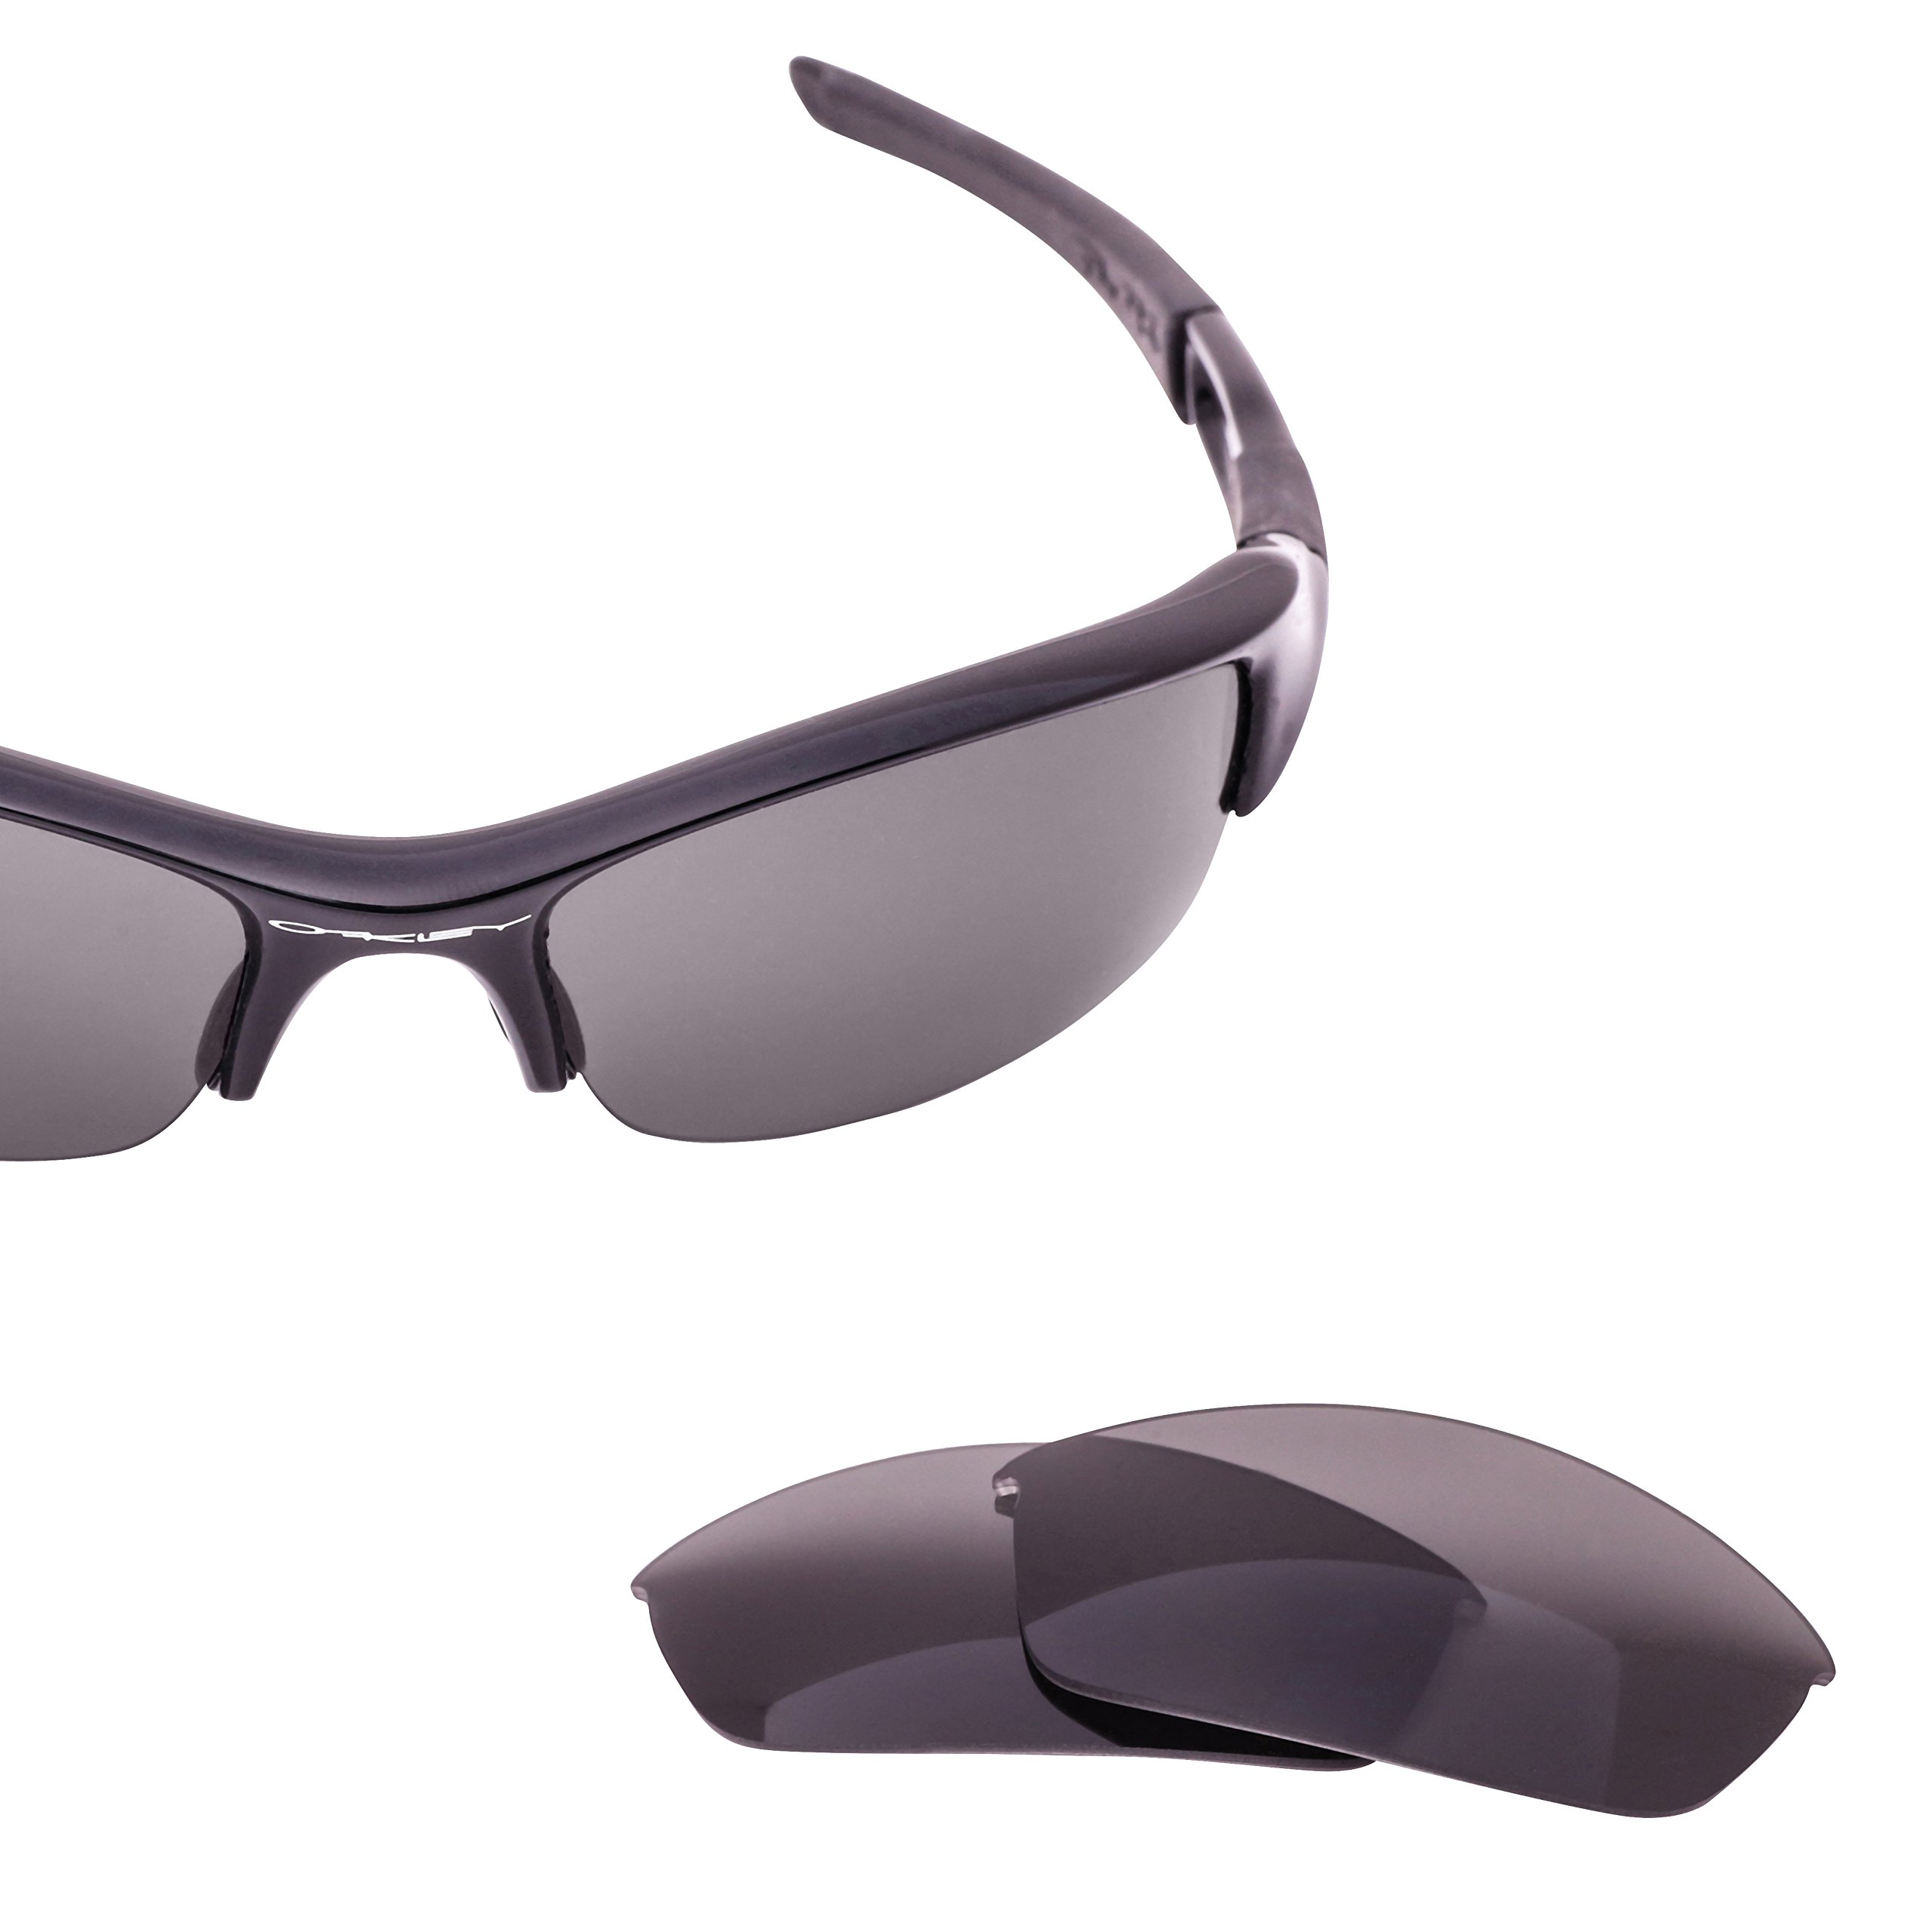 LenzFlip Replacement Lenses for Oakley FLAK JACKET Sunglass- Black Polarized Lenses by LenzFlip